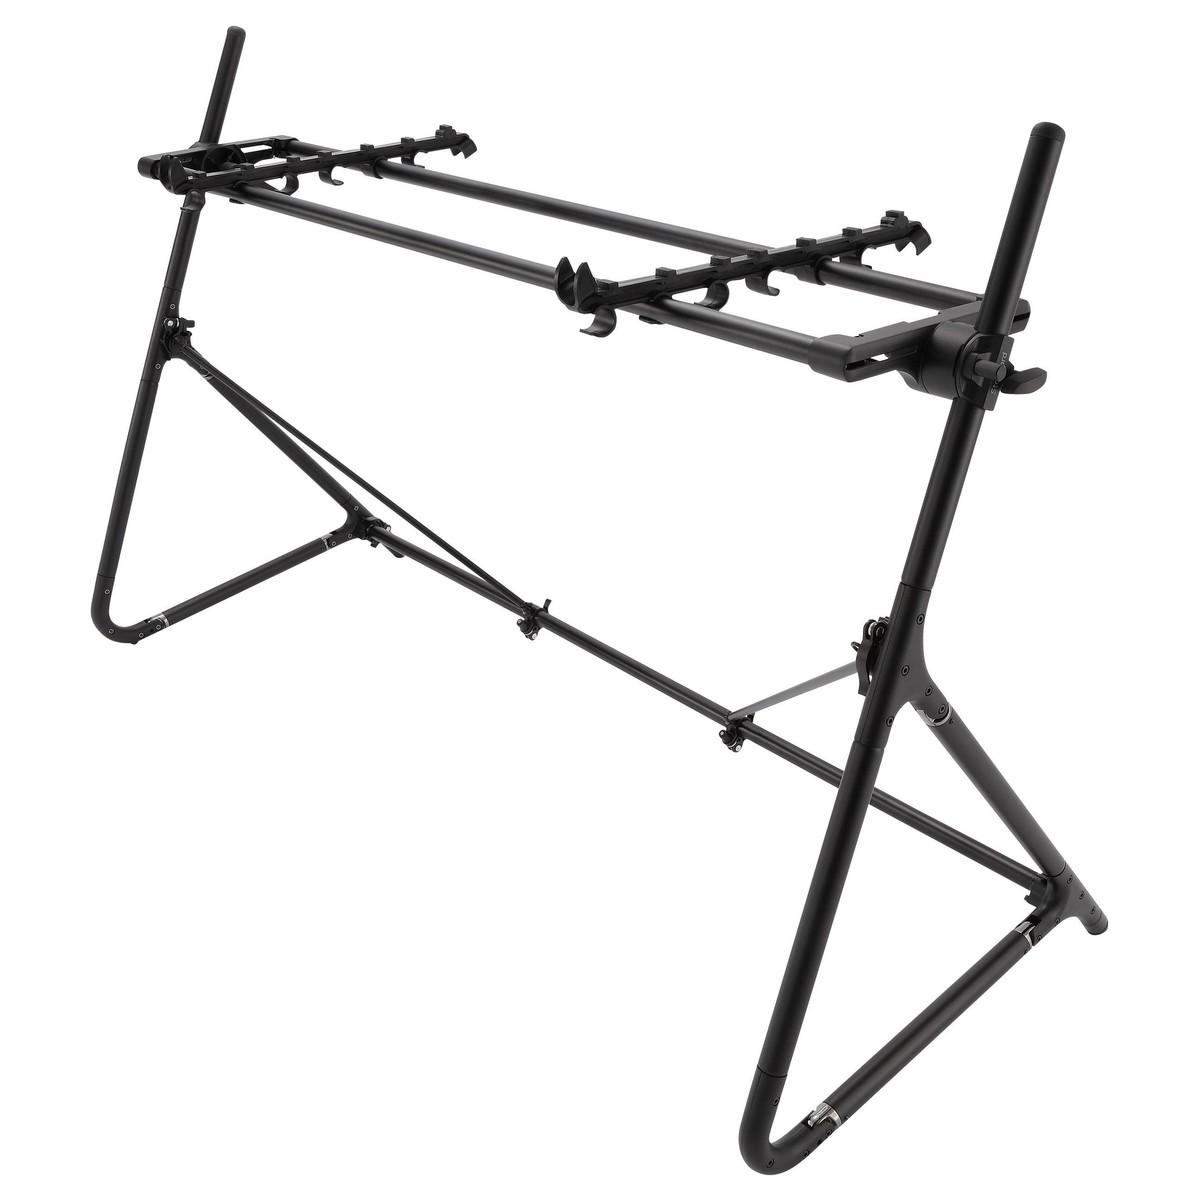 Sequenz Standard STD-L-ABK 88-Note Keyboard Stand, Black